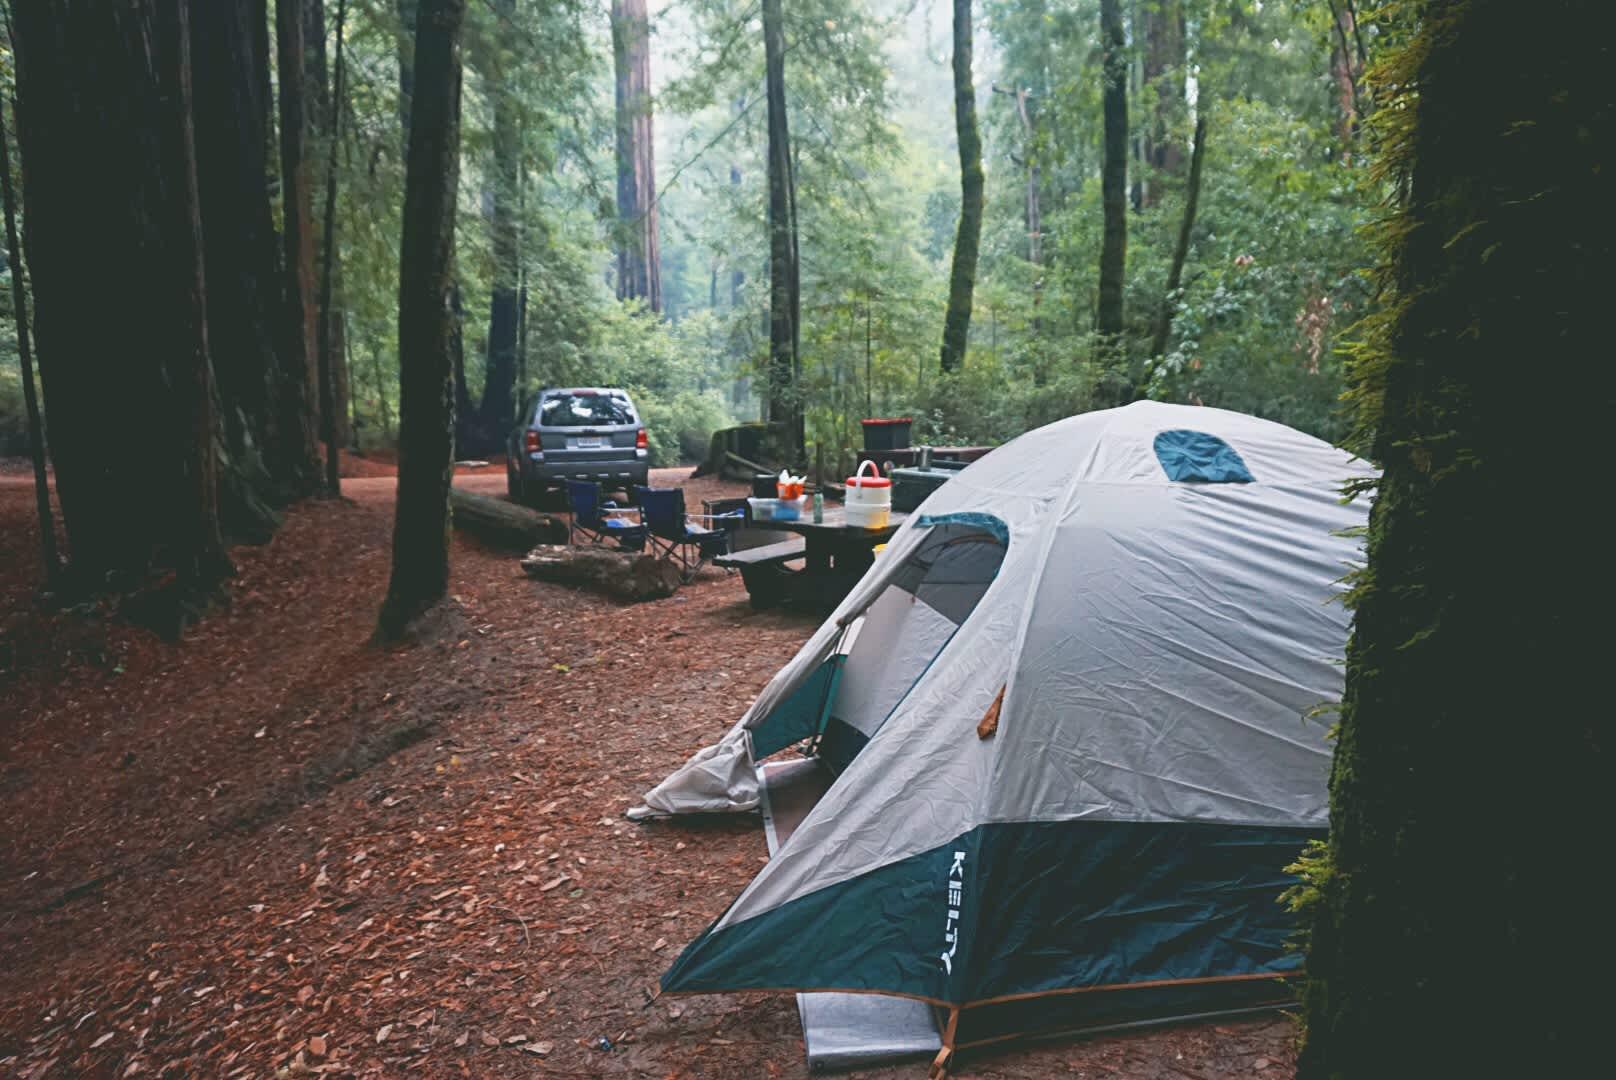 Huckleberry Campground, Big Basin Redwoods, CA: 15 Hipcamper Reviews ...